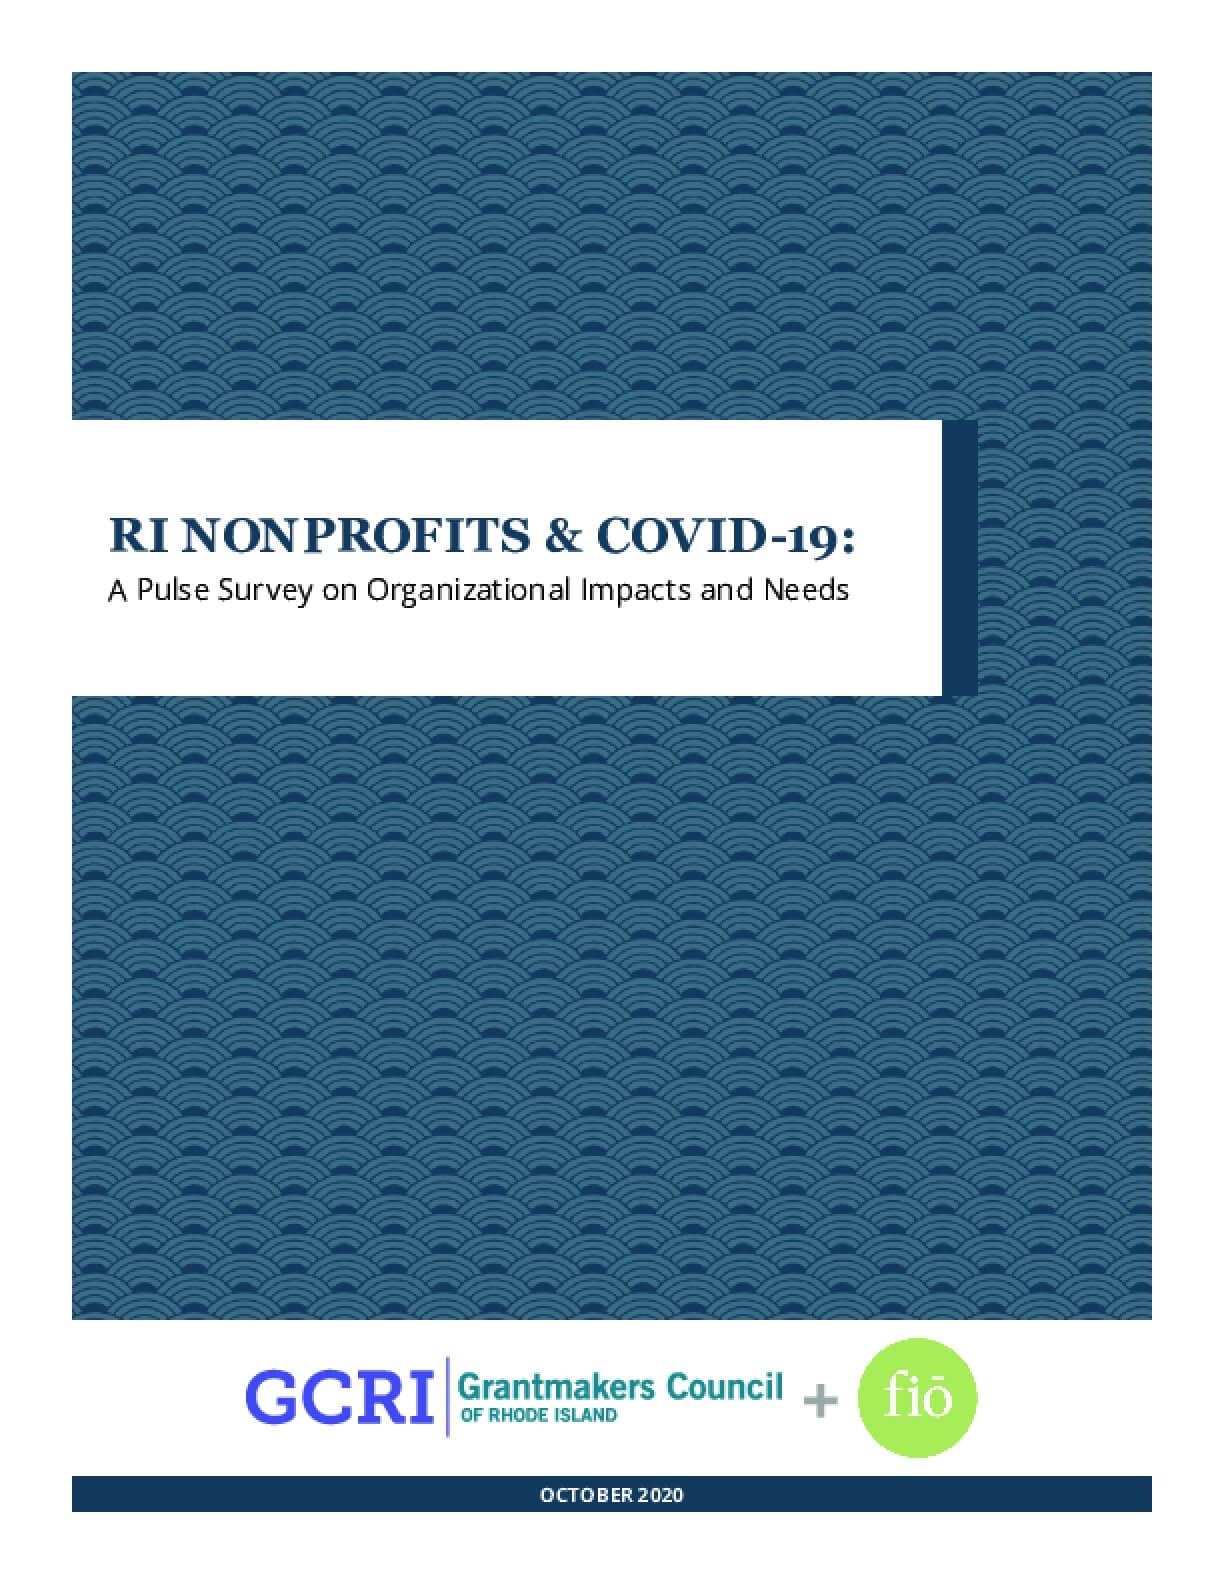 RI Nonprofits & COVID-19: A Pulse Survey on Organizational Impacts and Needs